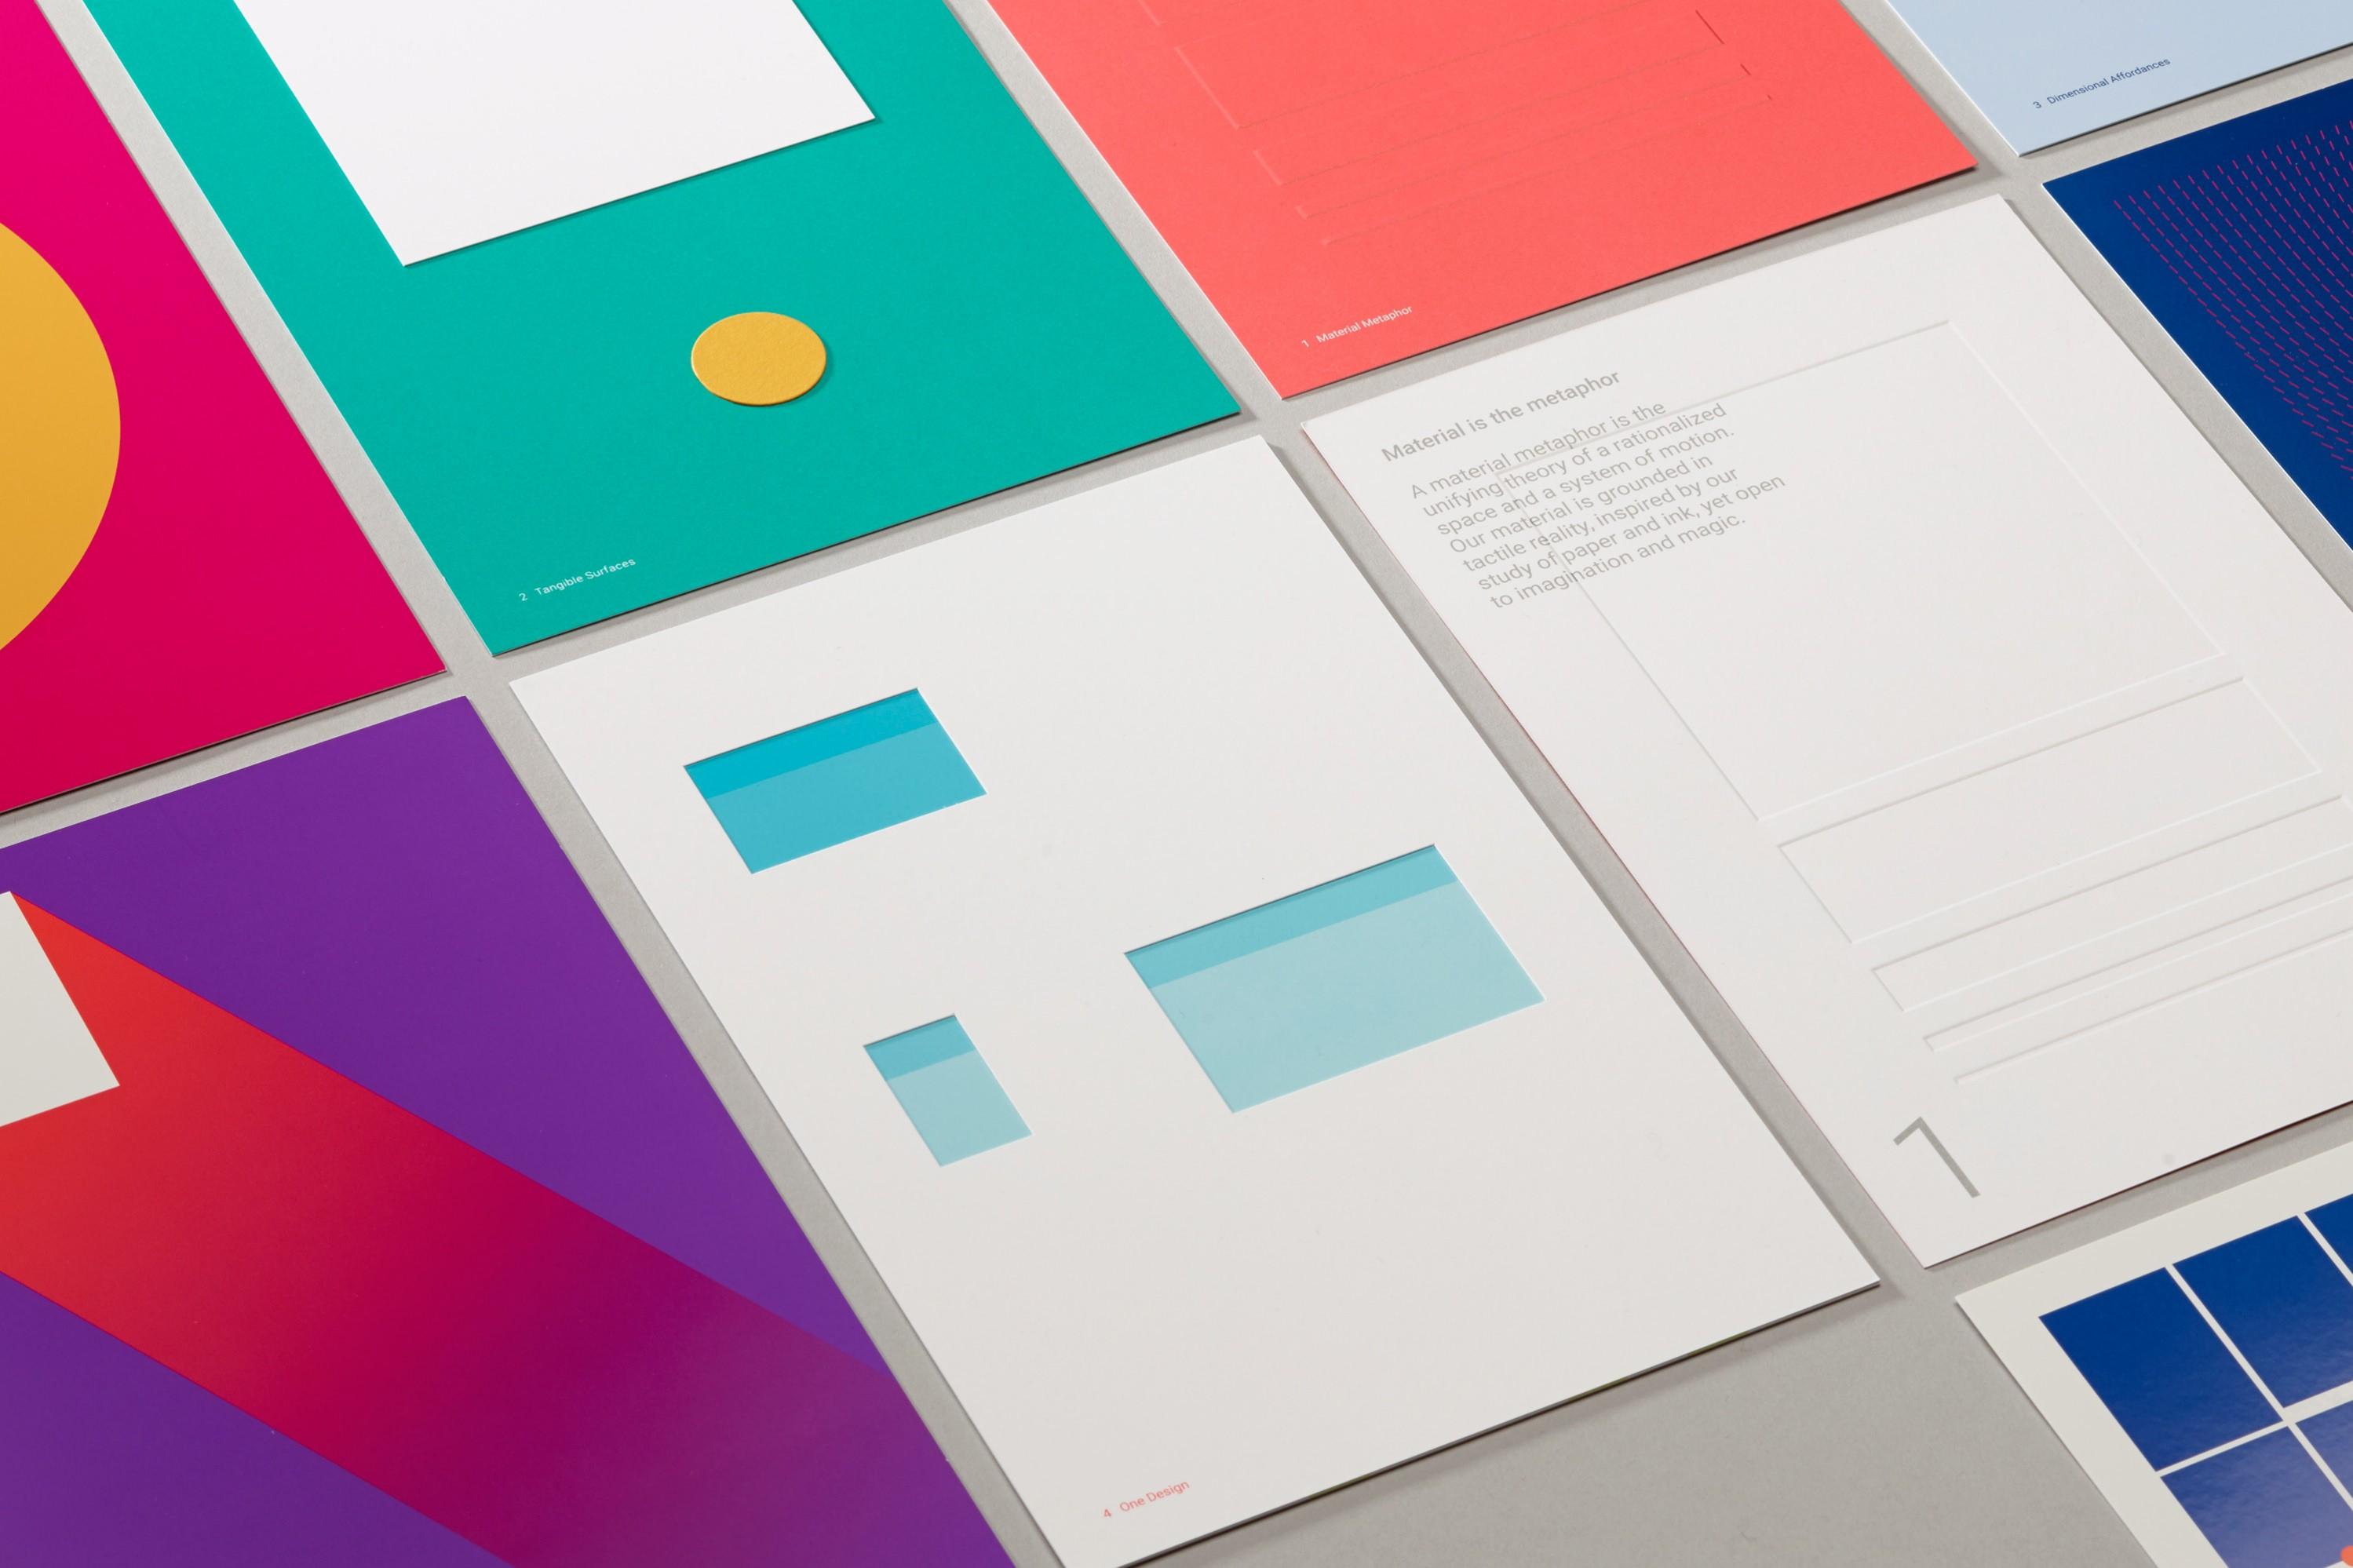 Google's Material Design